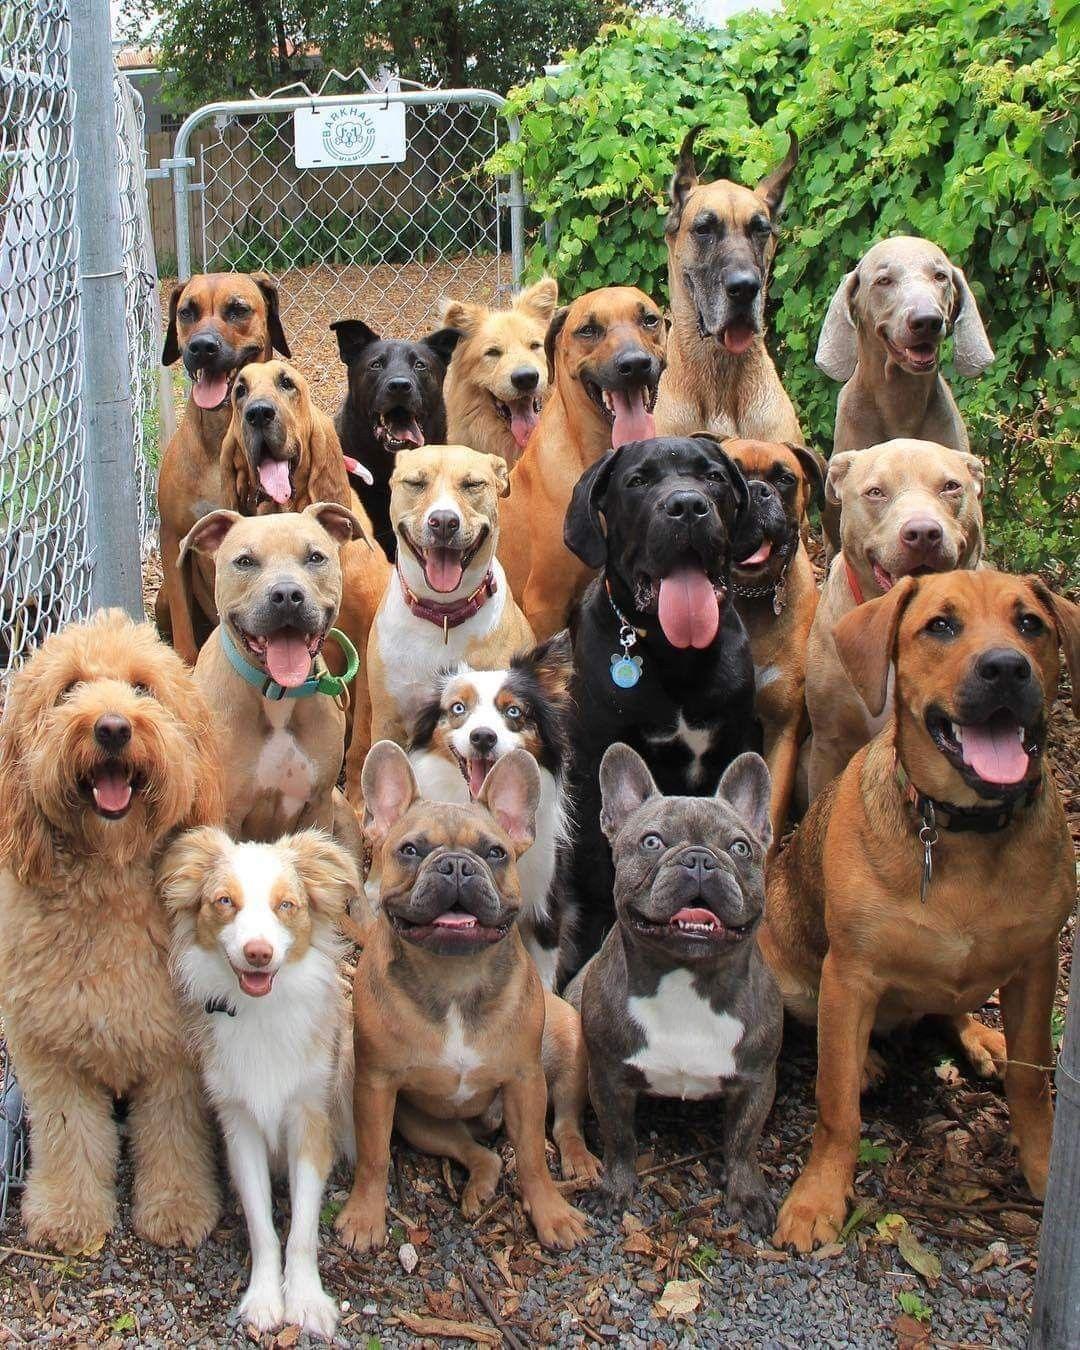 Pin Von Christina Bauer Auf Dogs Other Canines Tiere